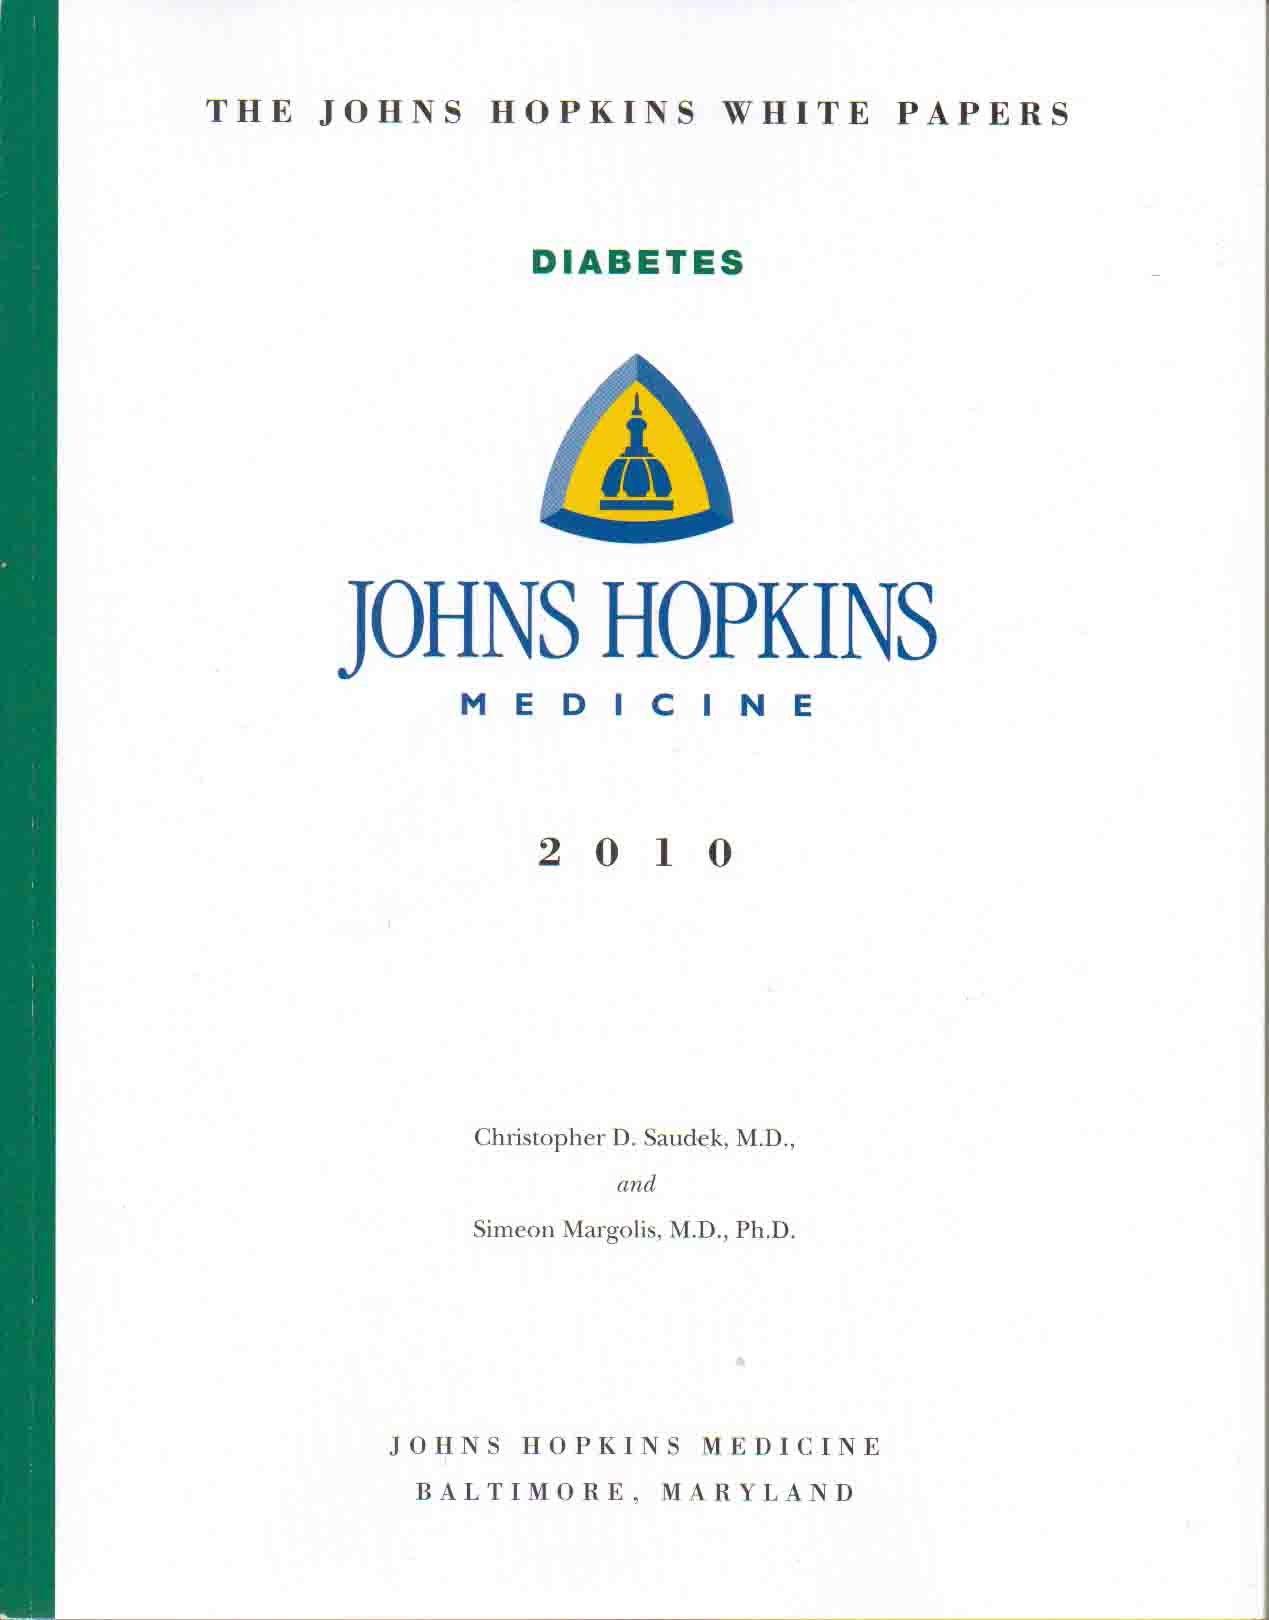 The Johns Hopkins White Papers: Diabetes PDF